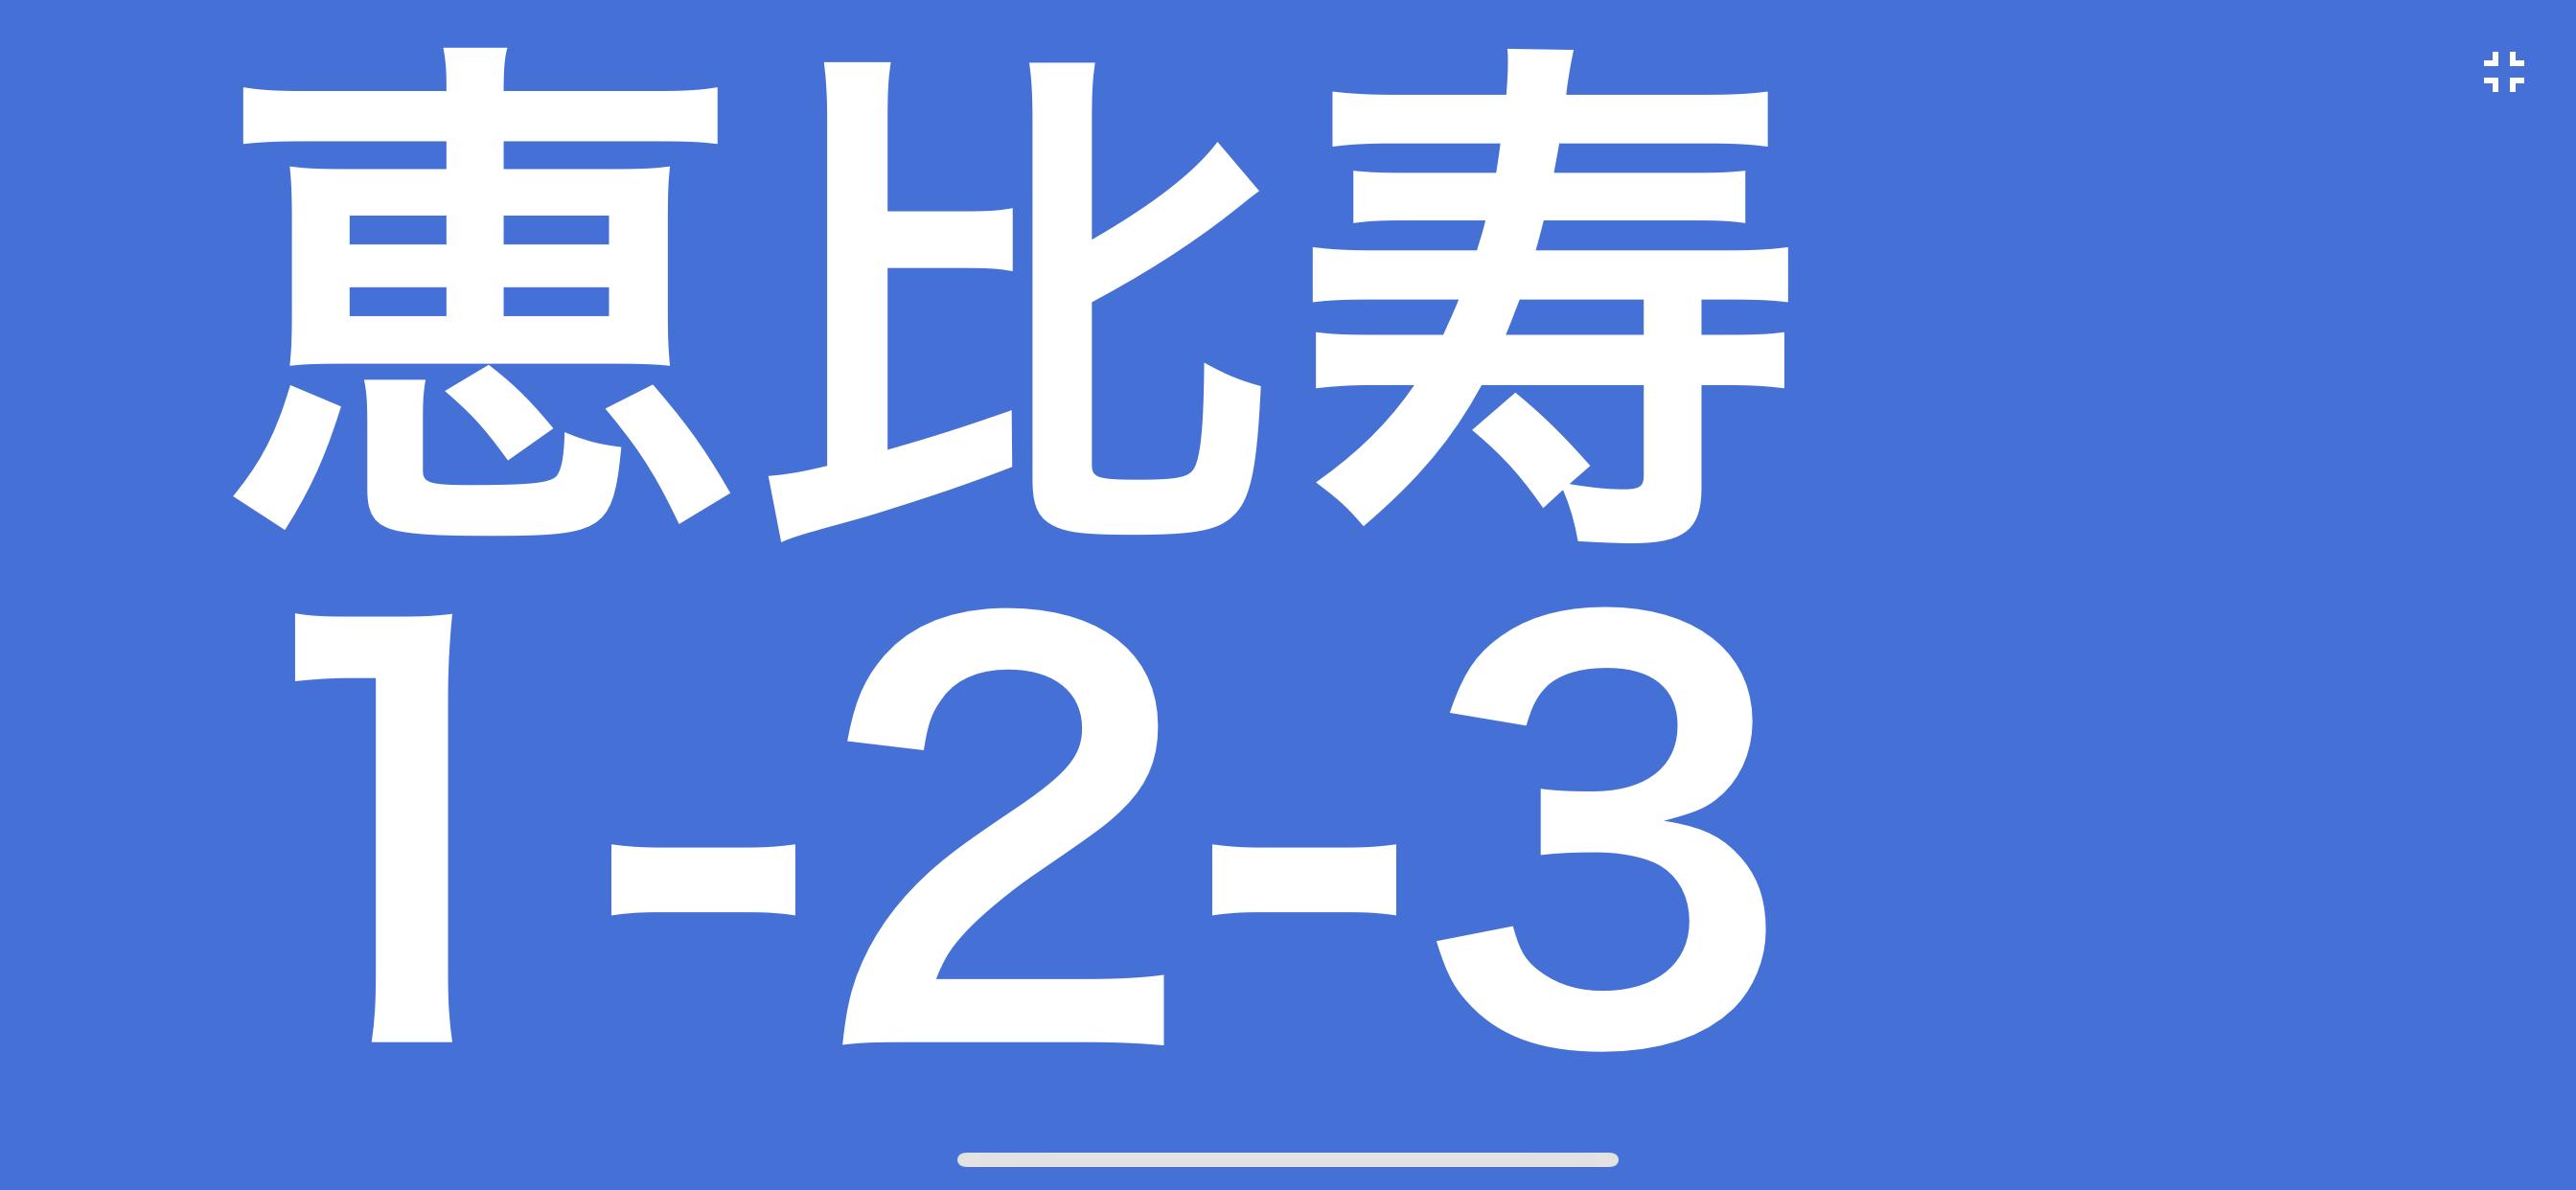 Google Translate shows address in full screen